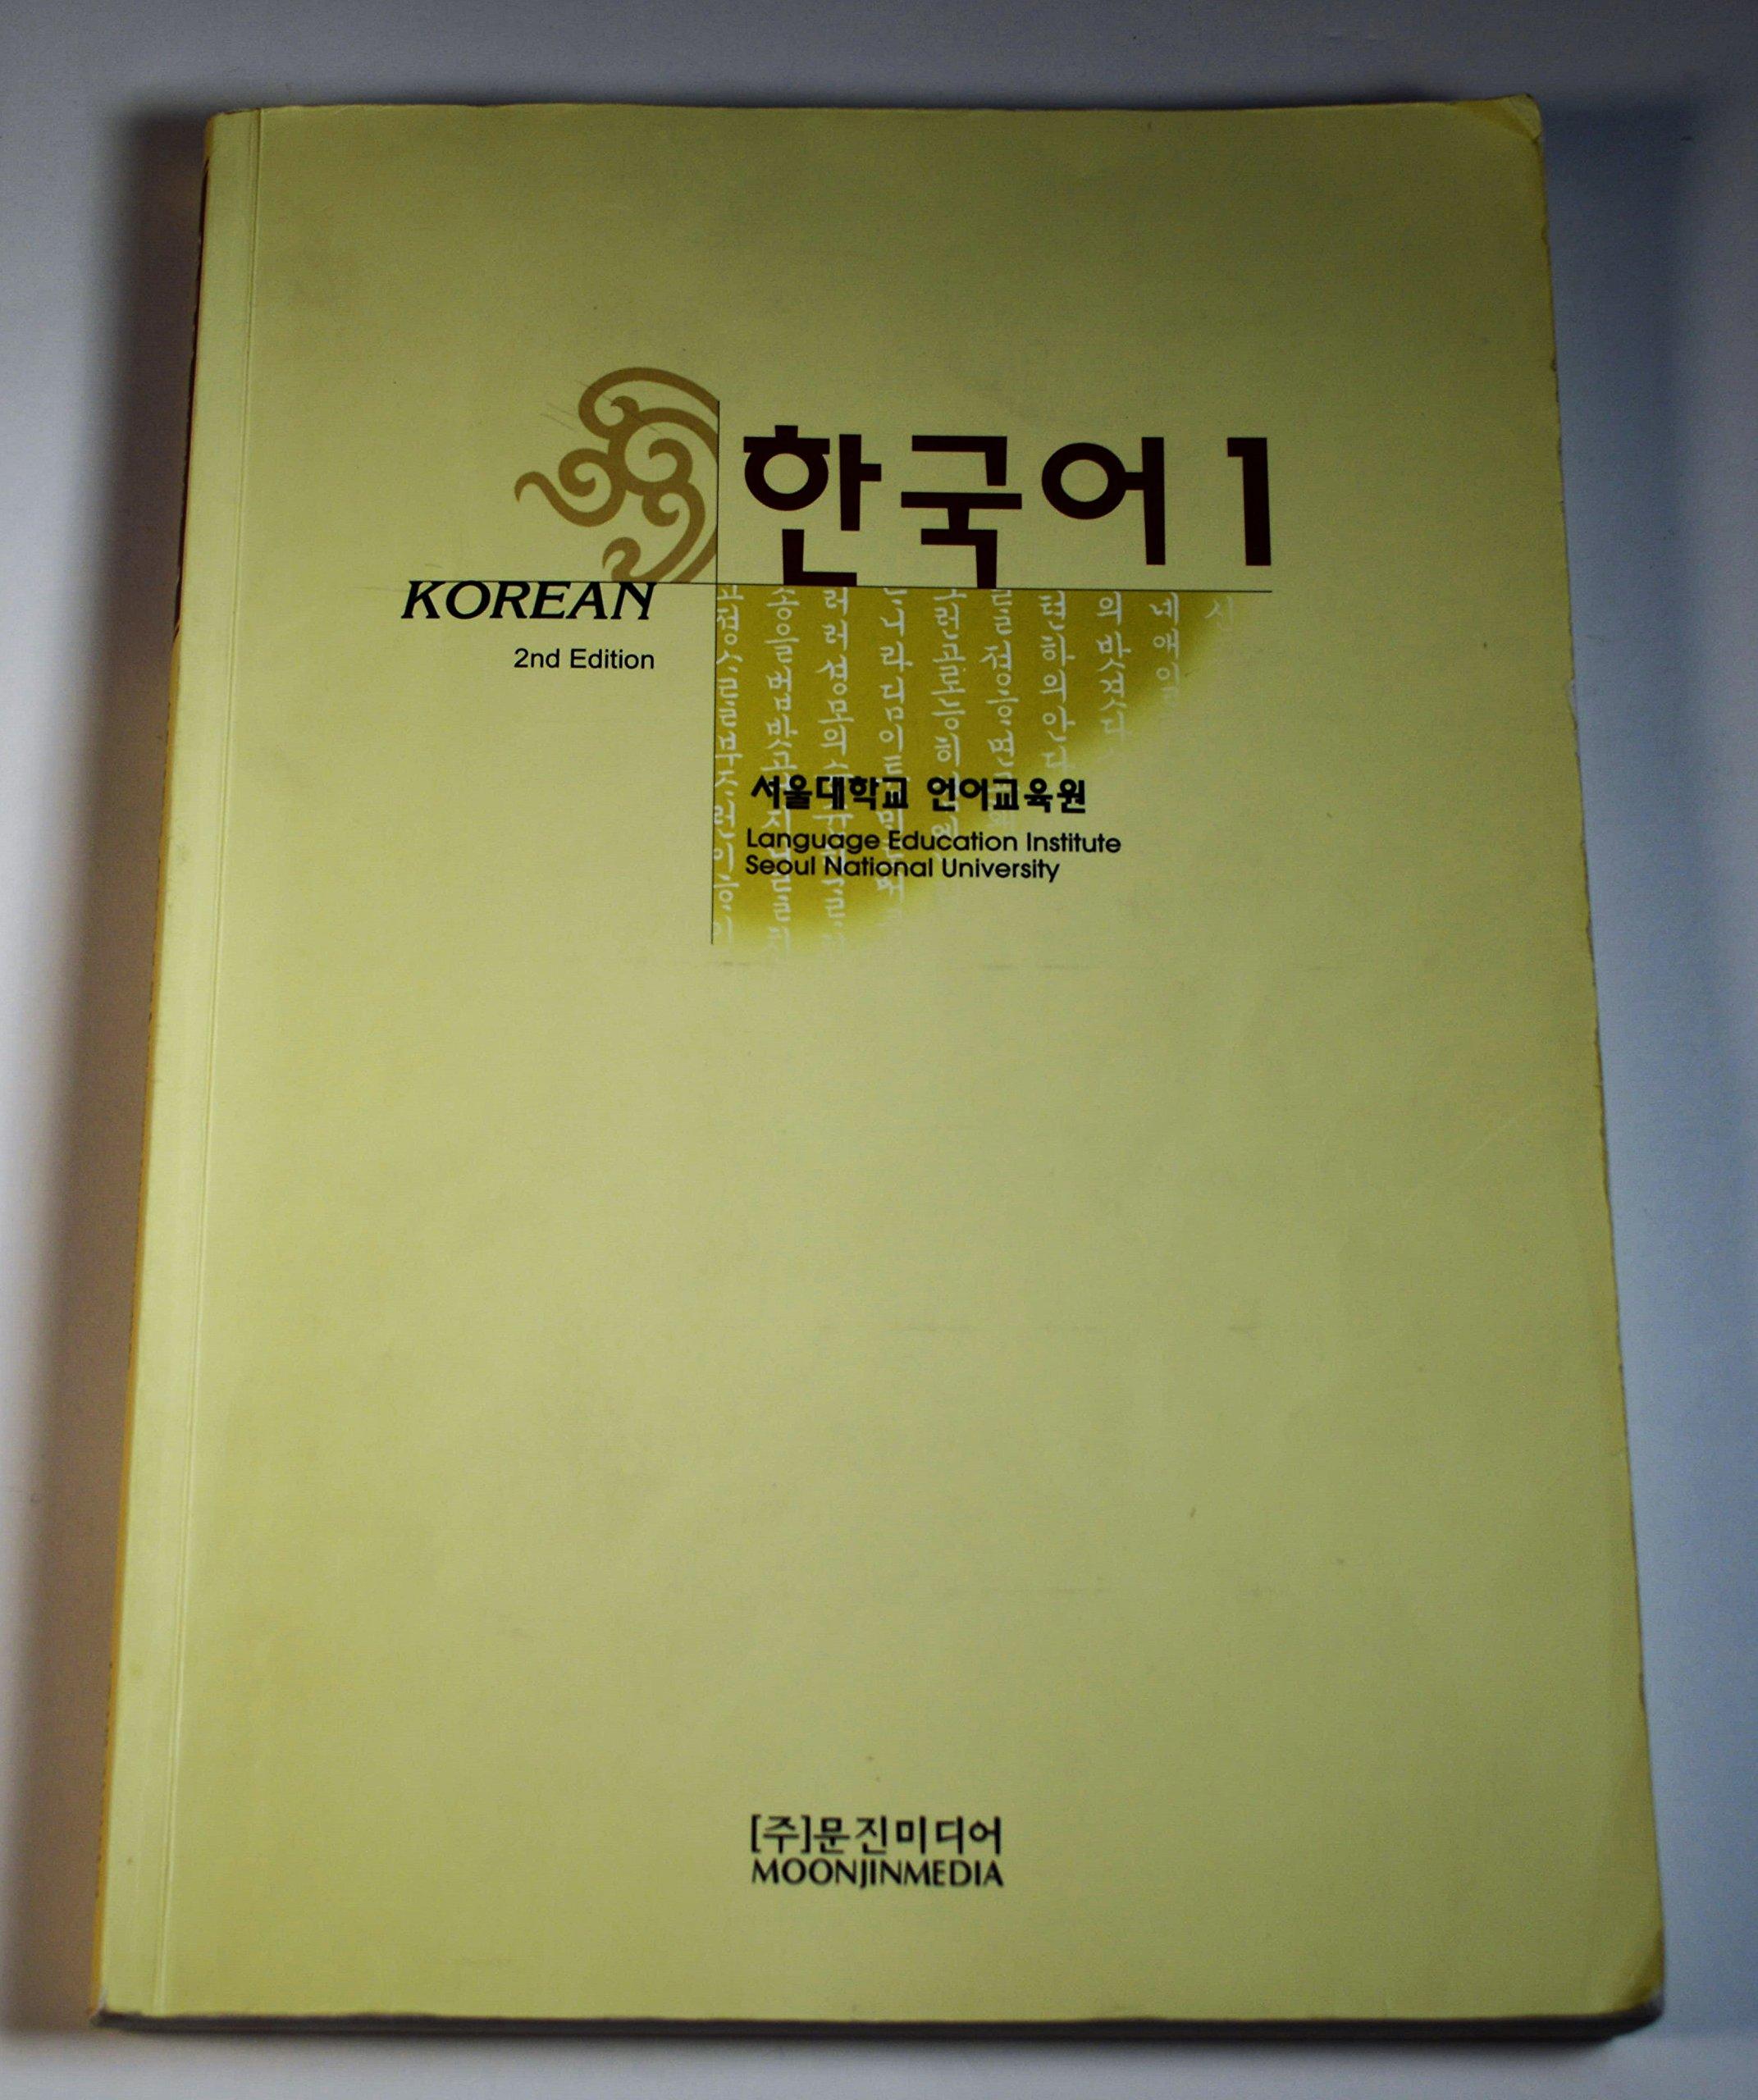 KOREAN TEXTBOOK EBOOK